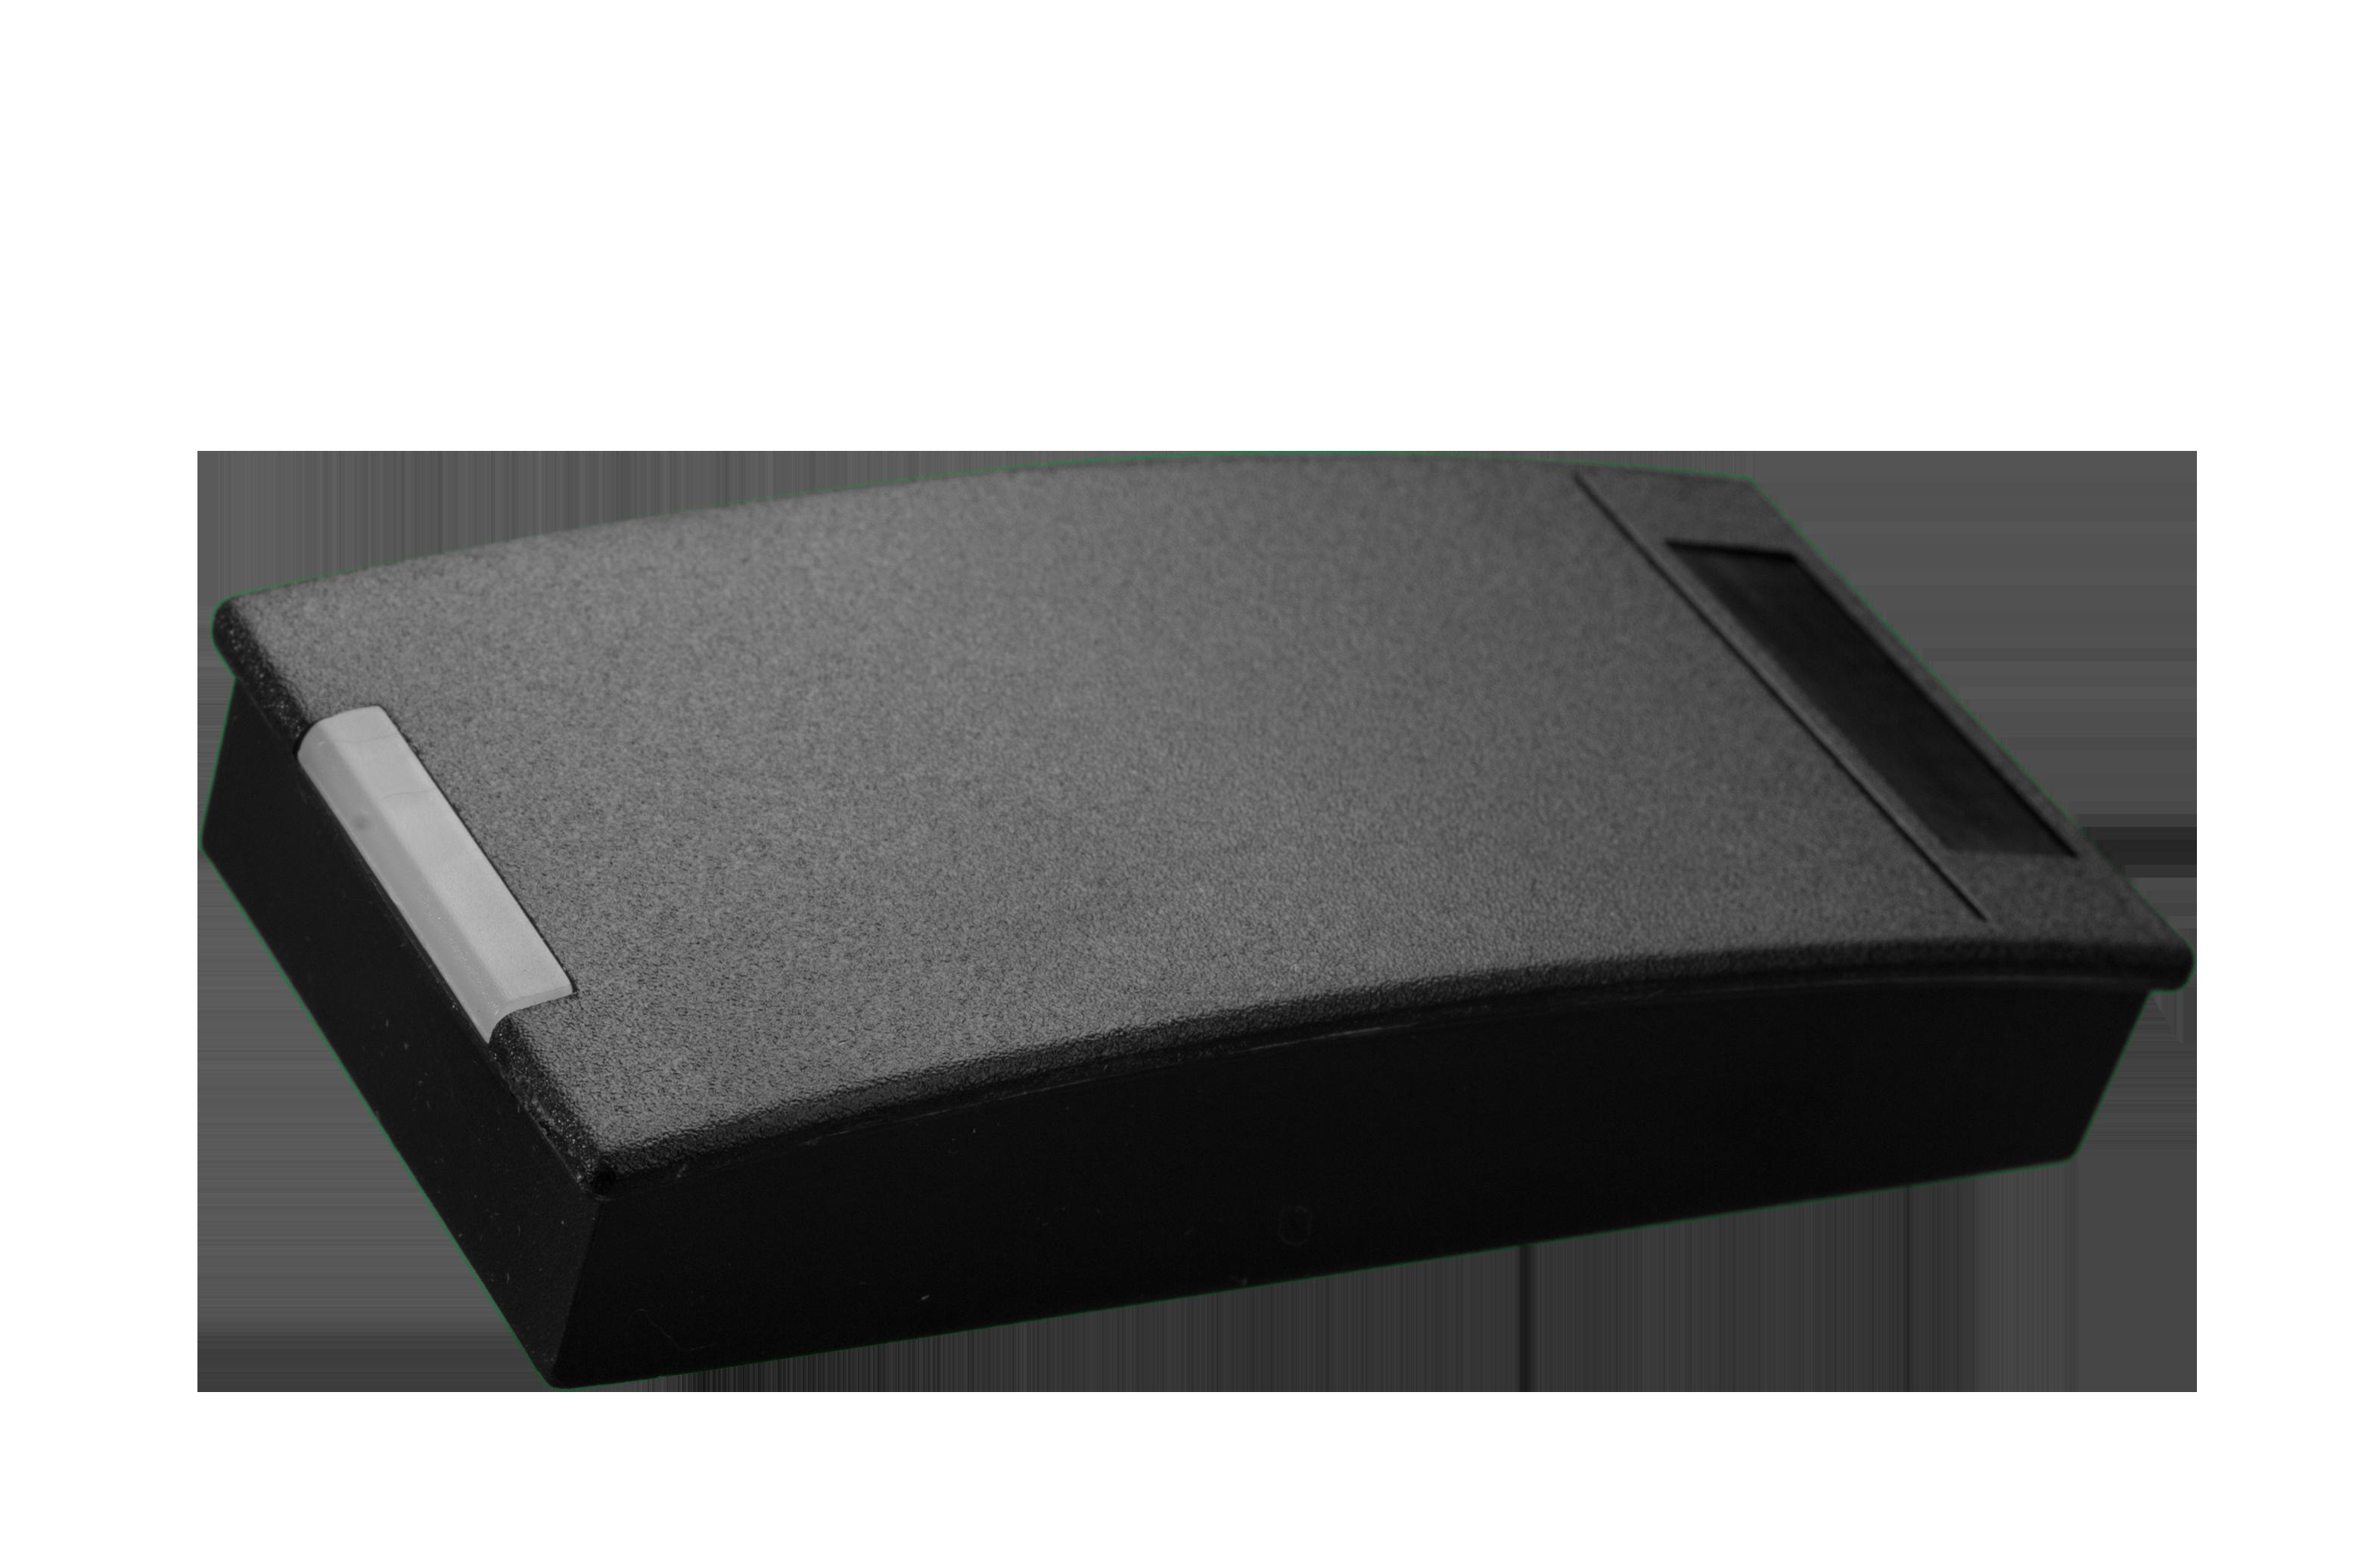 Считыватель Mifare NT10C 13,56 МГц